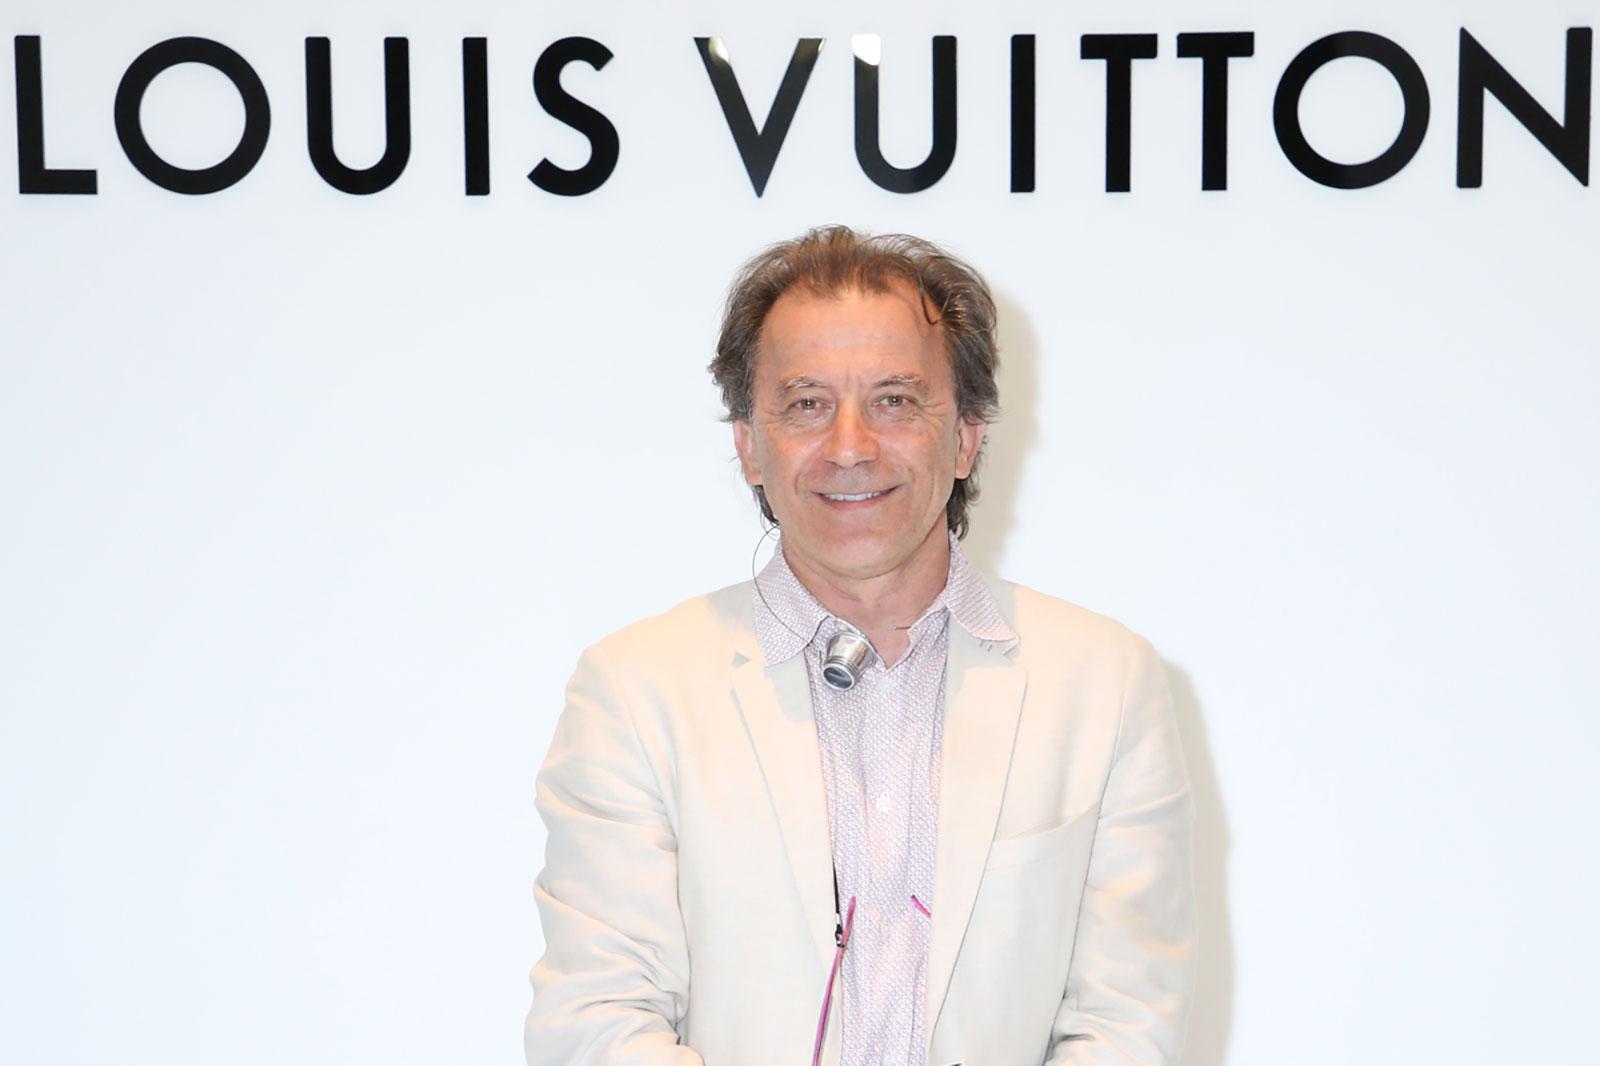 Michel Navas Louis Vuitton